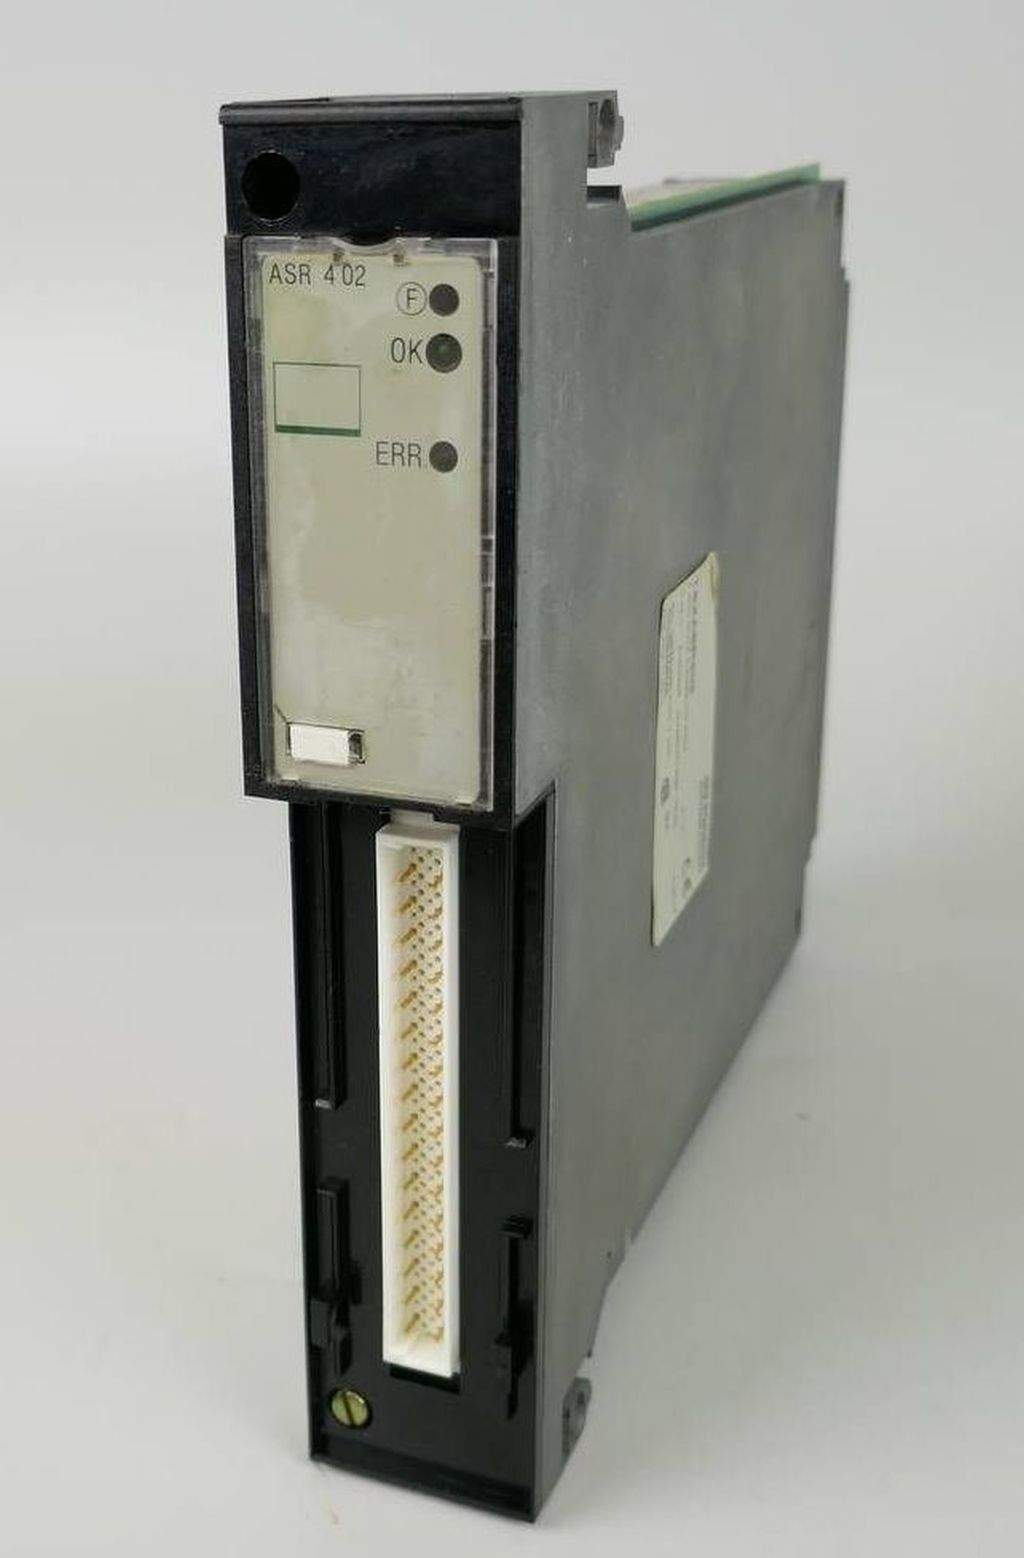 FgTech Galletto V54 upgrade fw 0475 EU NXP LPC2119FBD64//01 Nuovo Vergine MCU